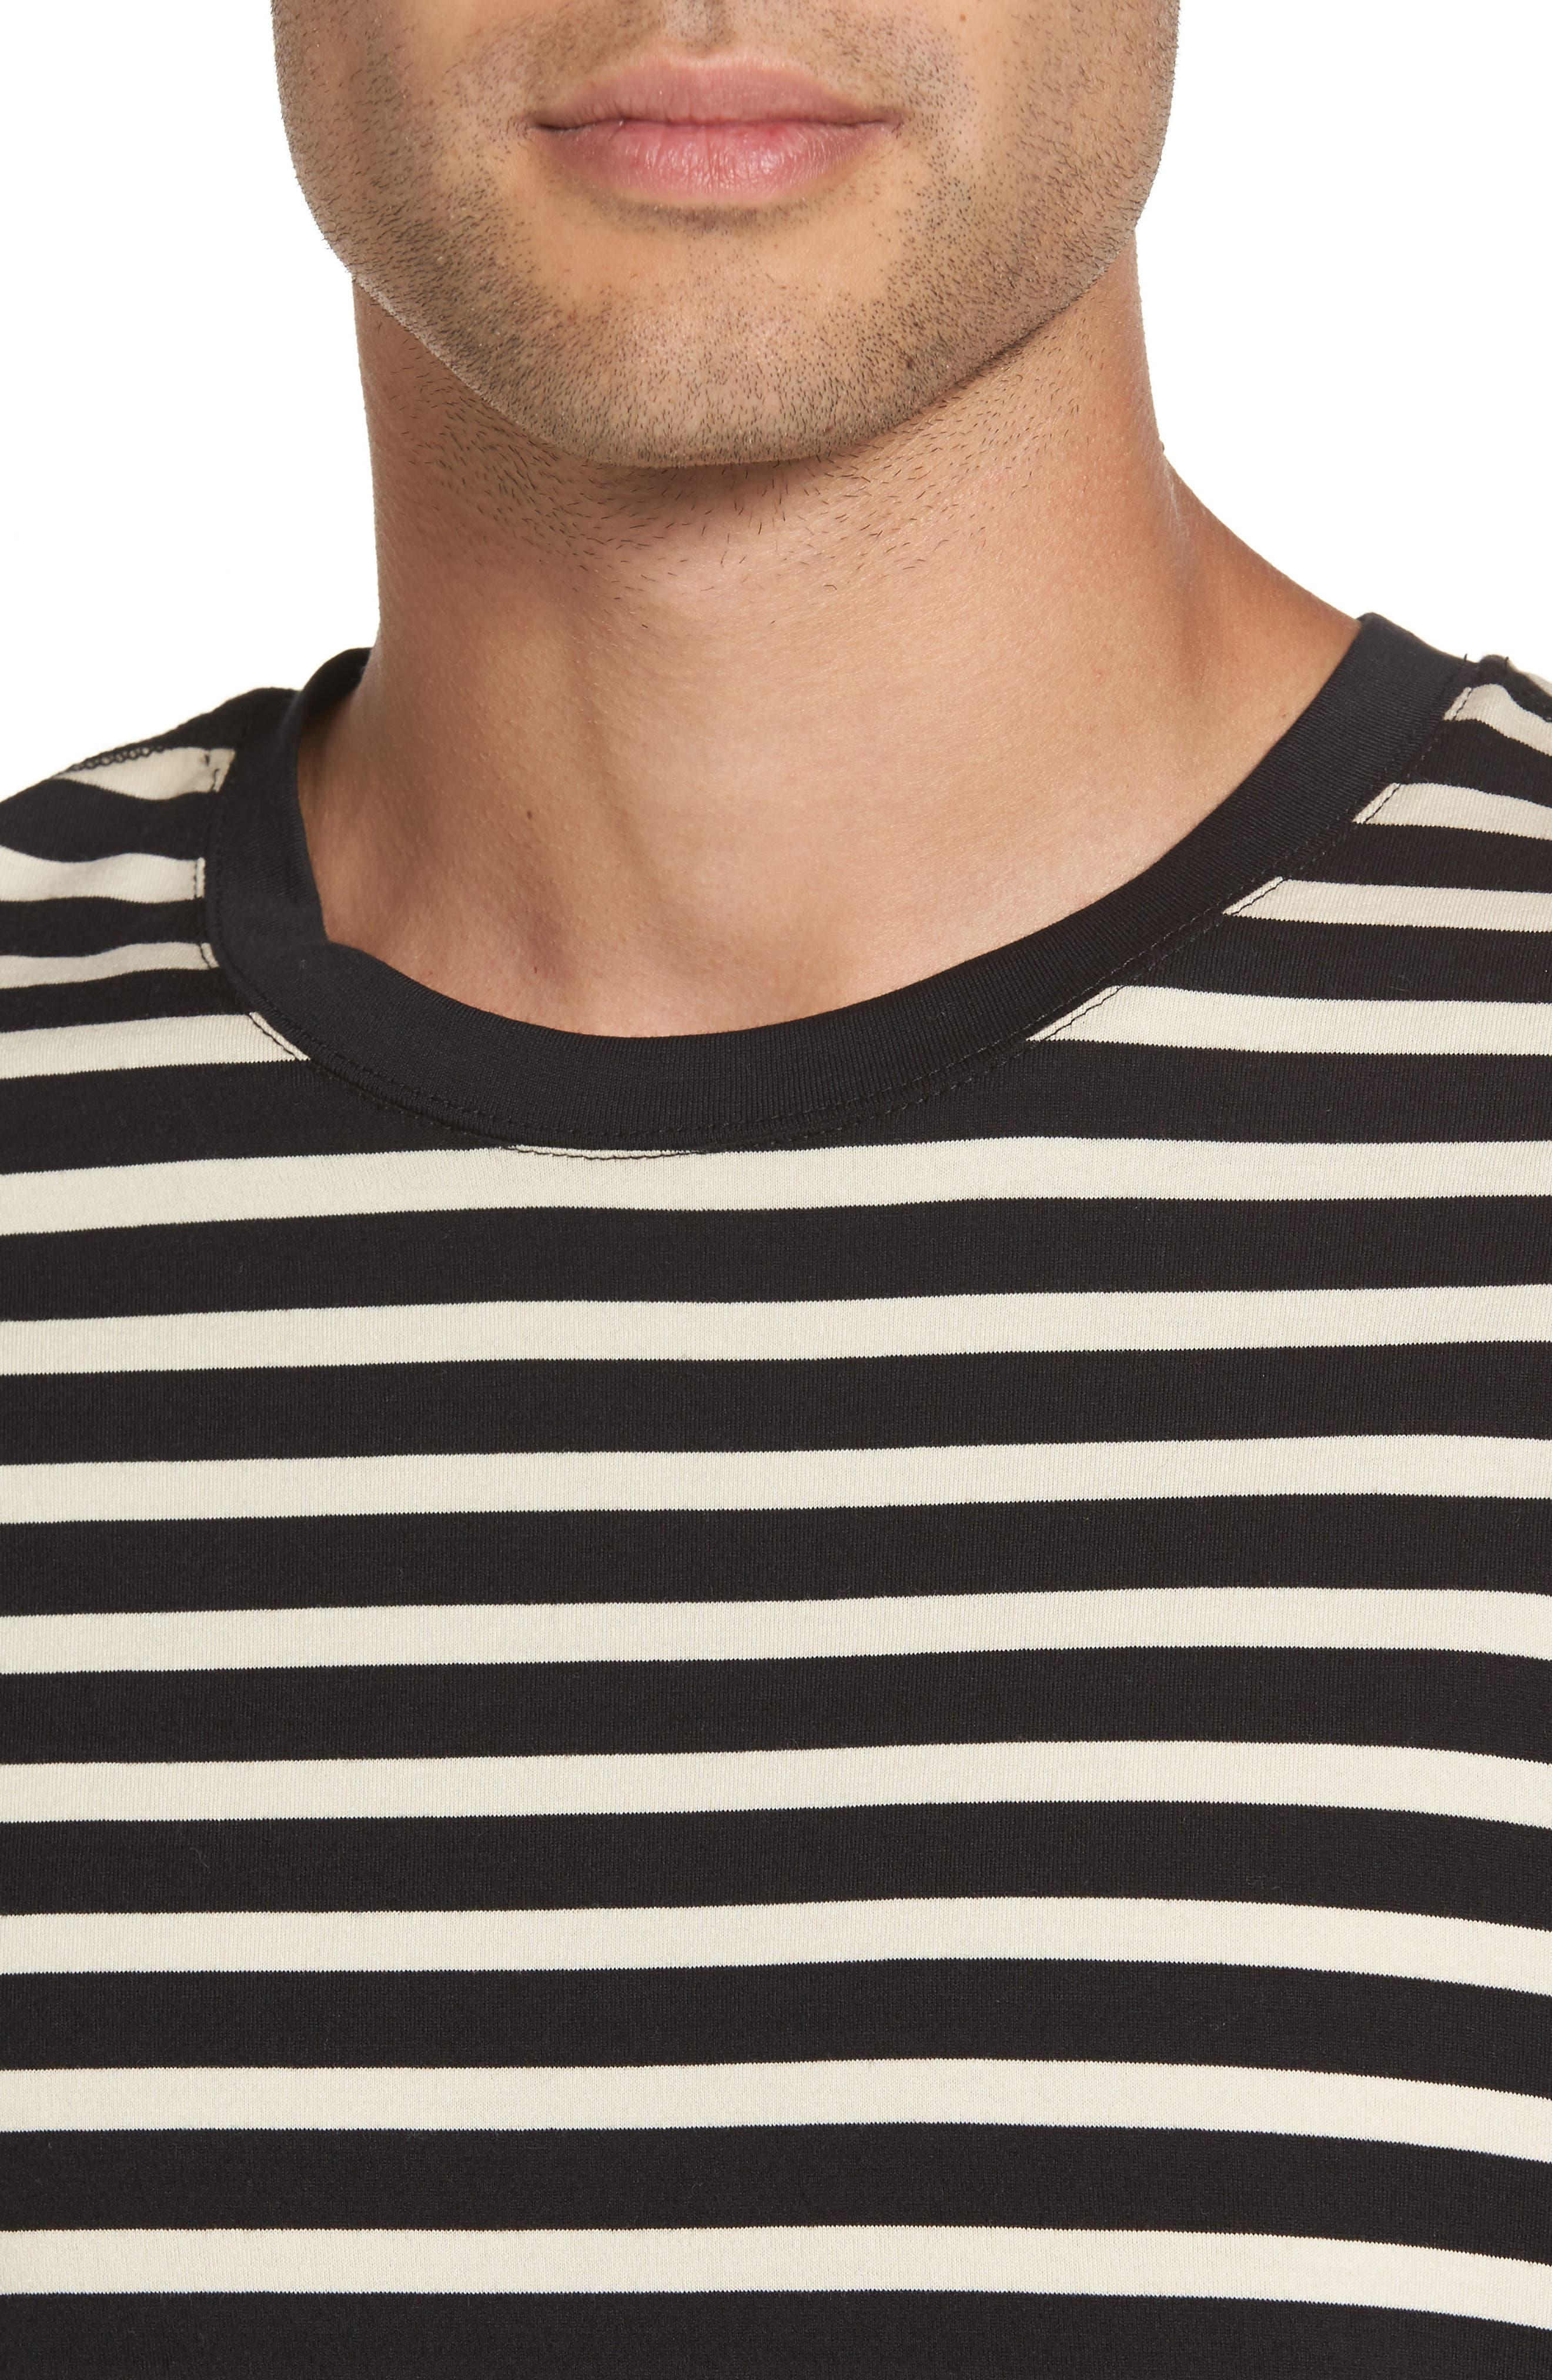 Stripe T-Shirt,                             Alternate thumbnail 4, color,                             Black/ Off White